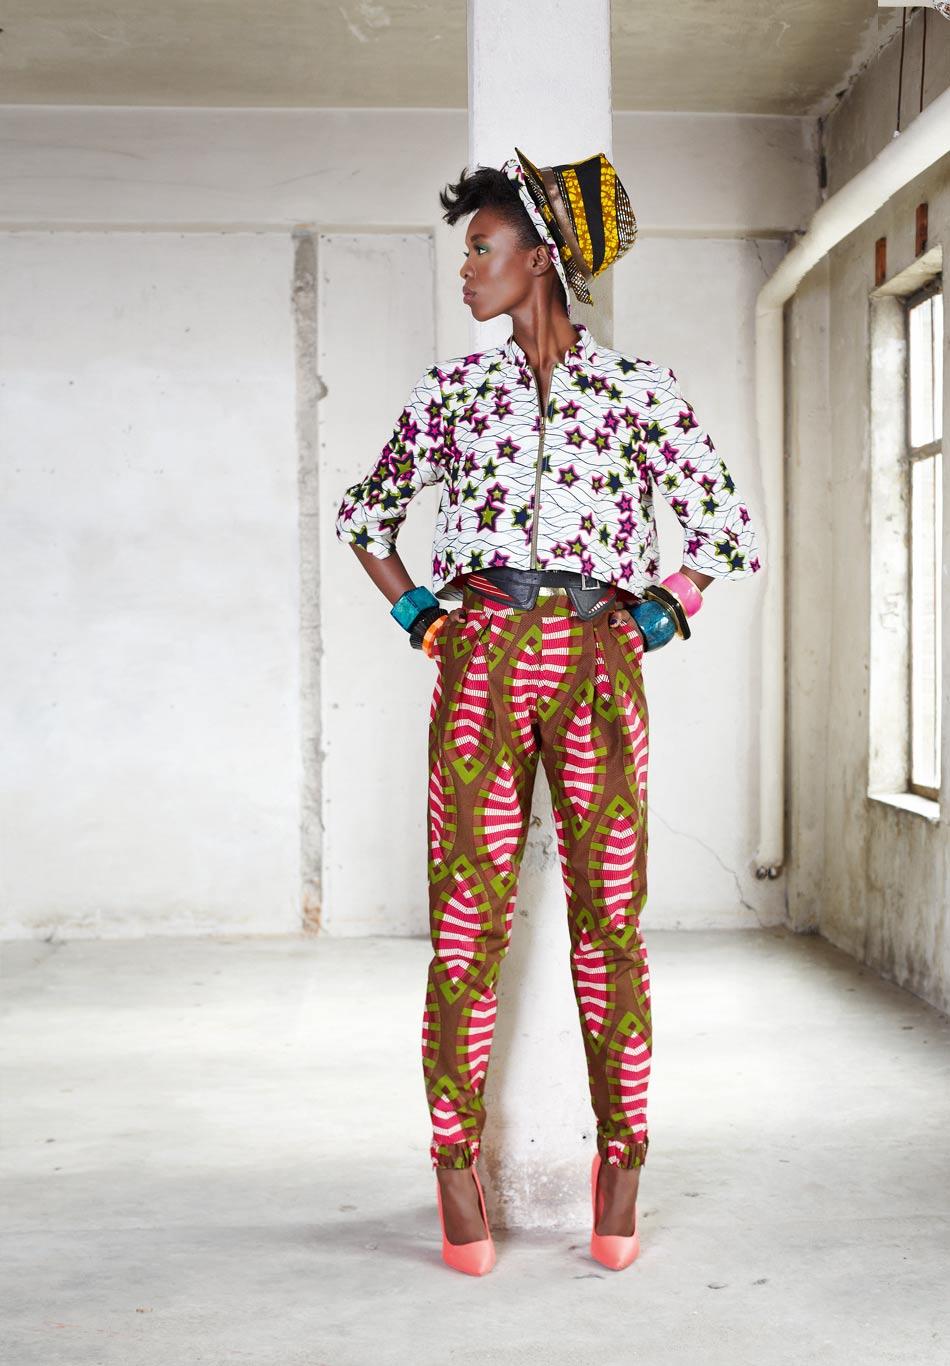 Funk fashion clothing